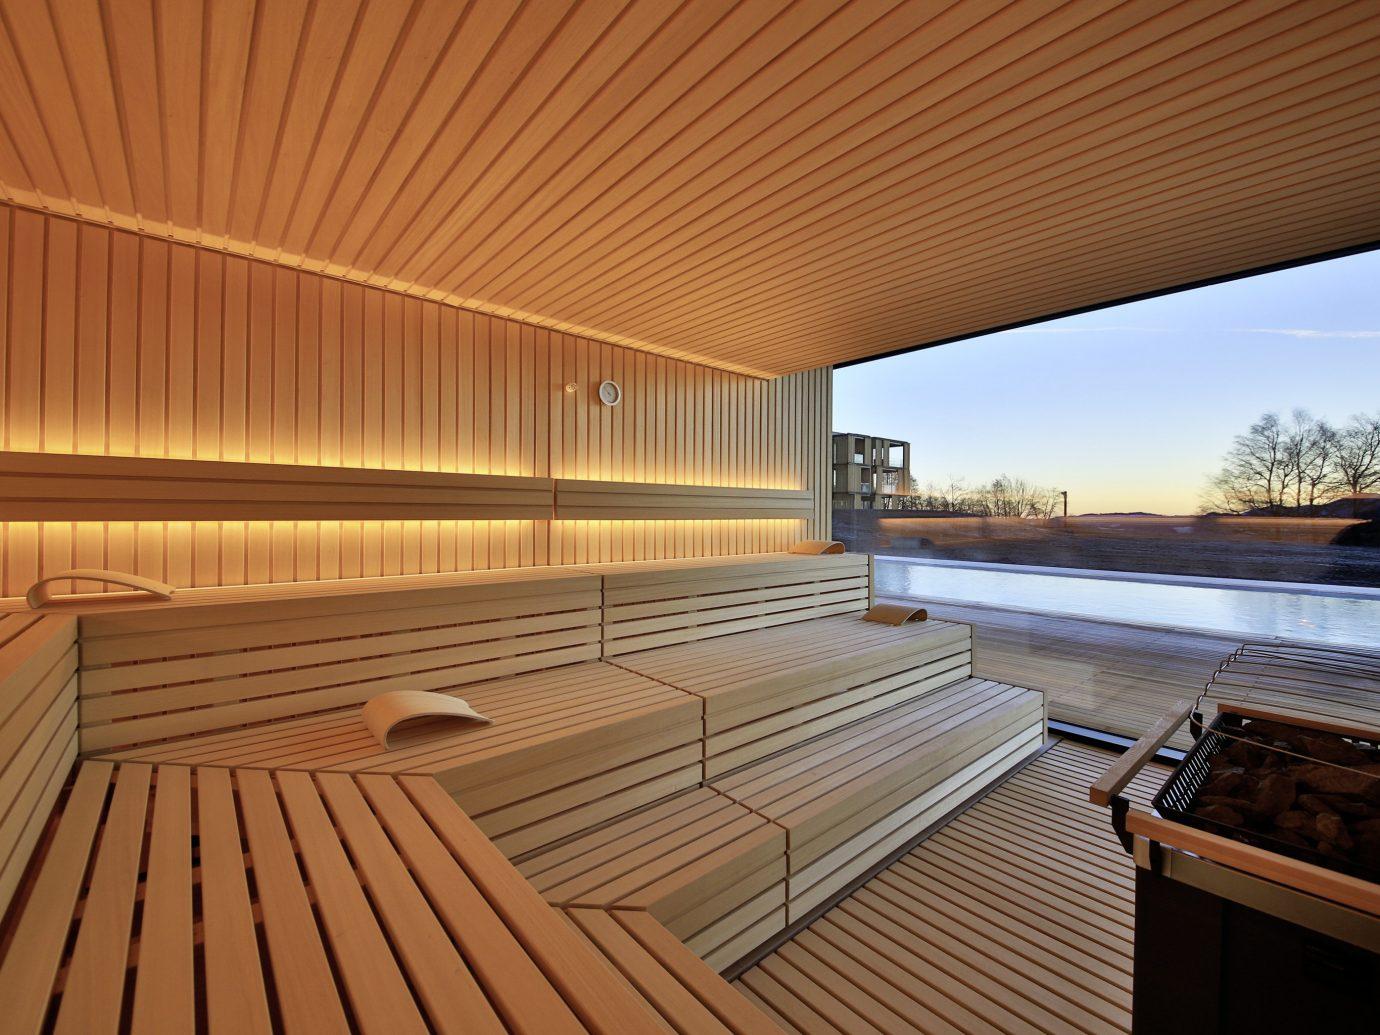 Trip Ideas building swimming pool ceiling room daylighting wood interior design Deck